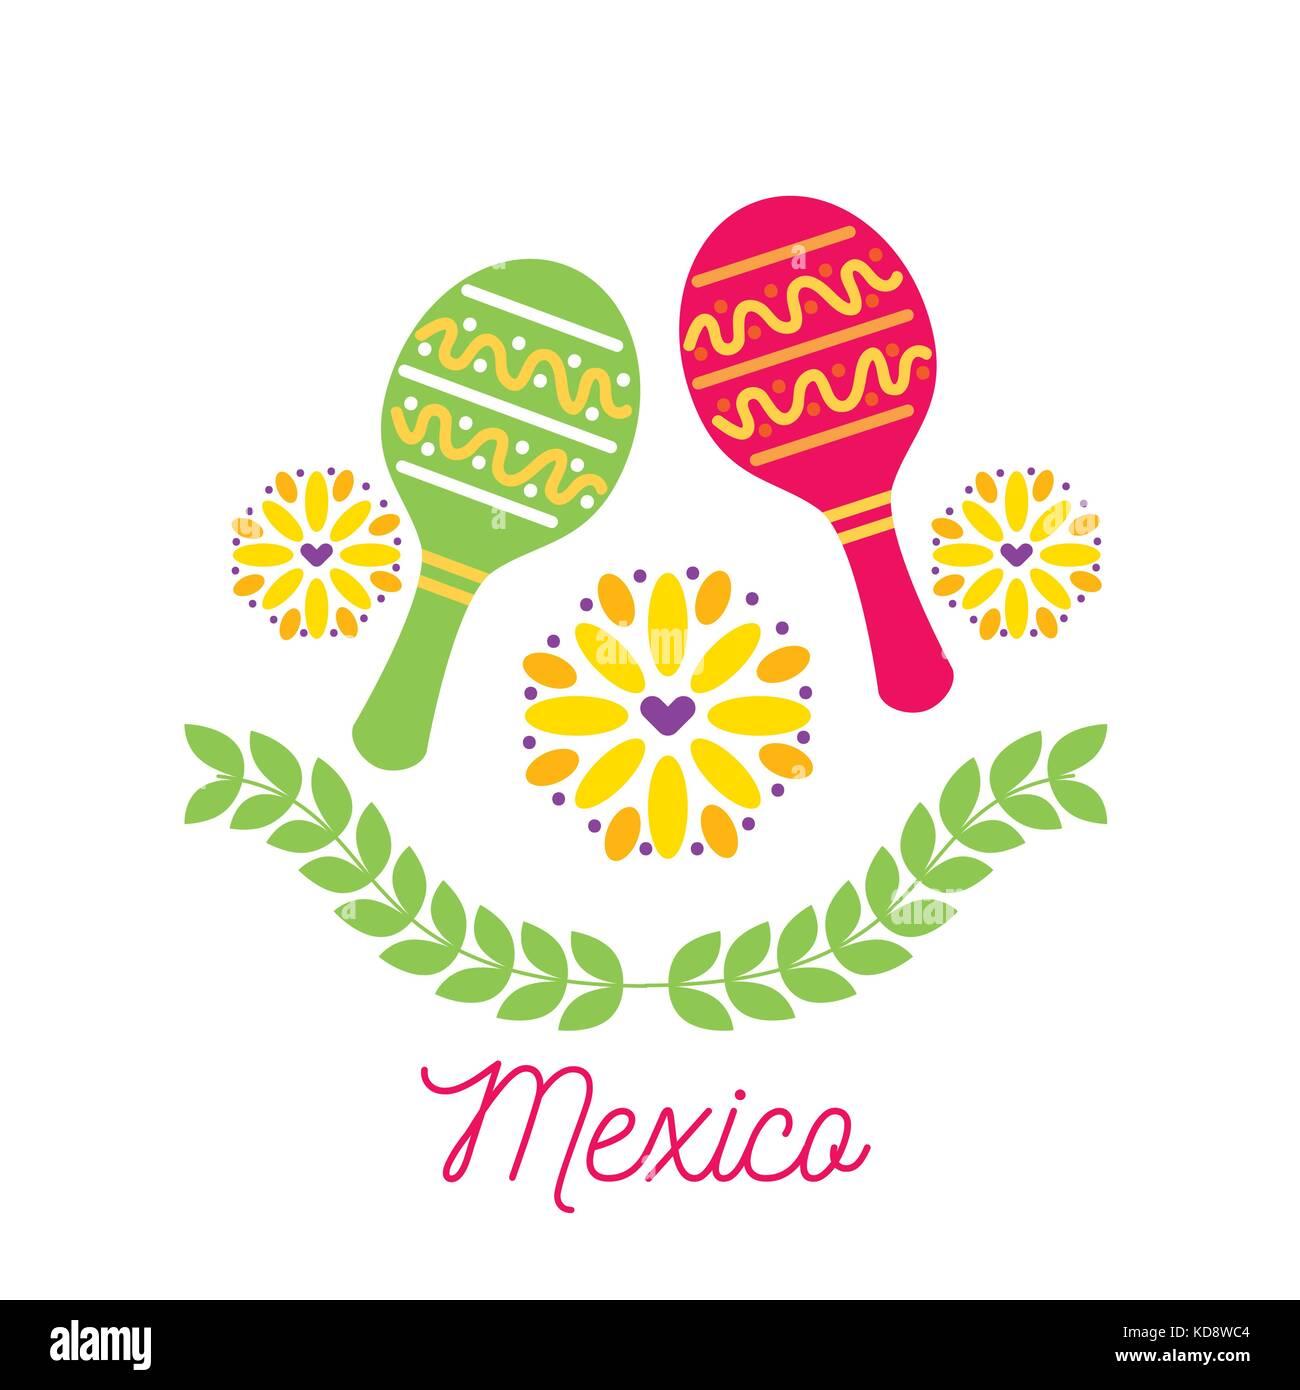 mexico card maraca flowers festival carnival invitation - Stock Image